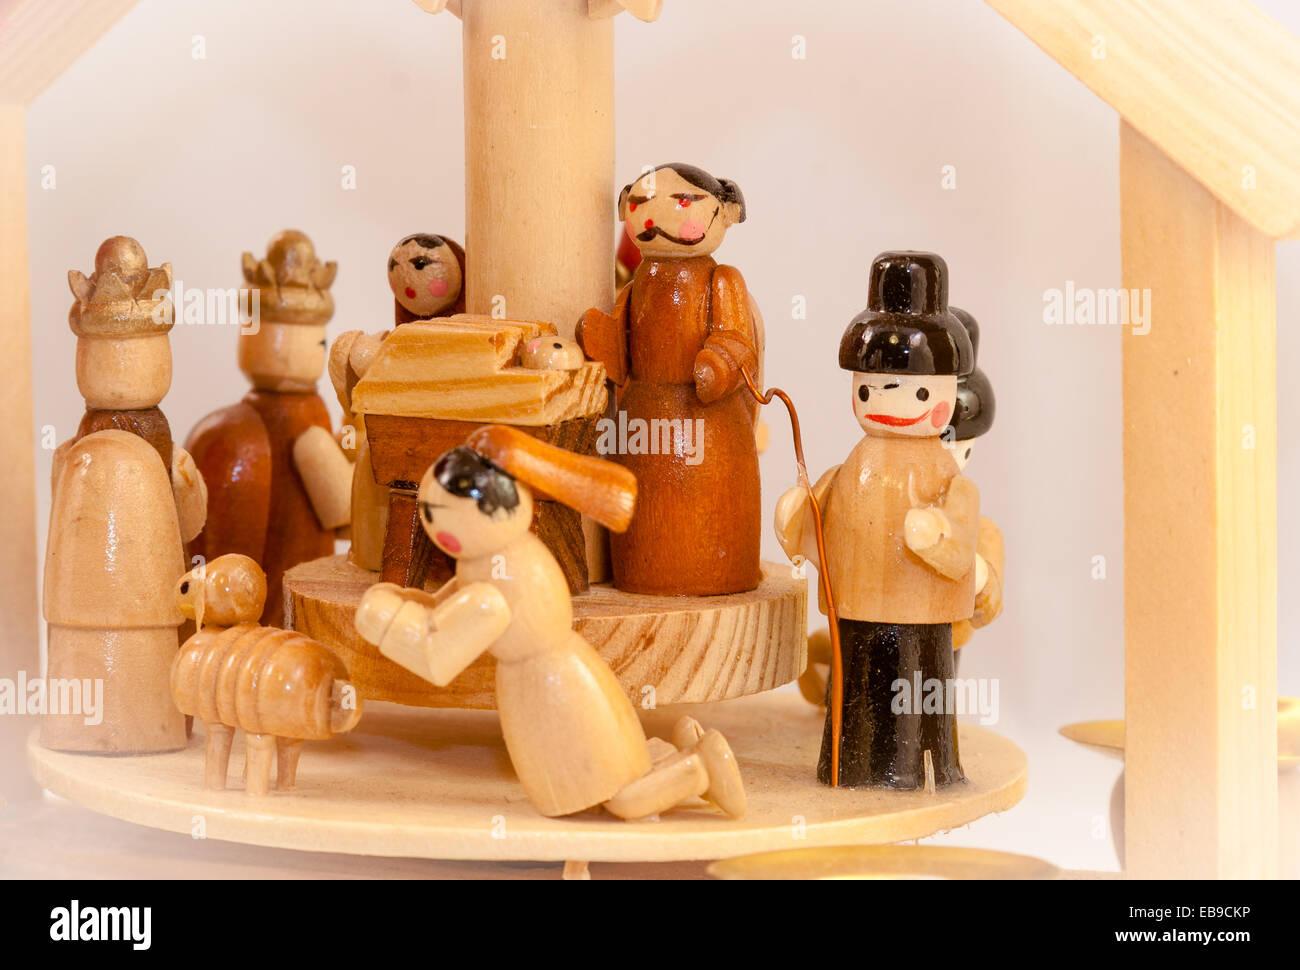 small wooden crib - Stock Image